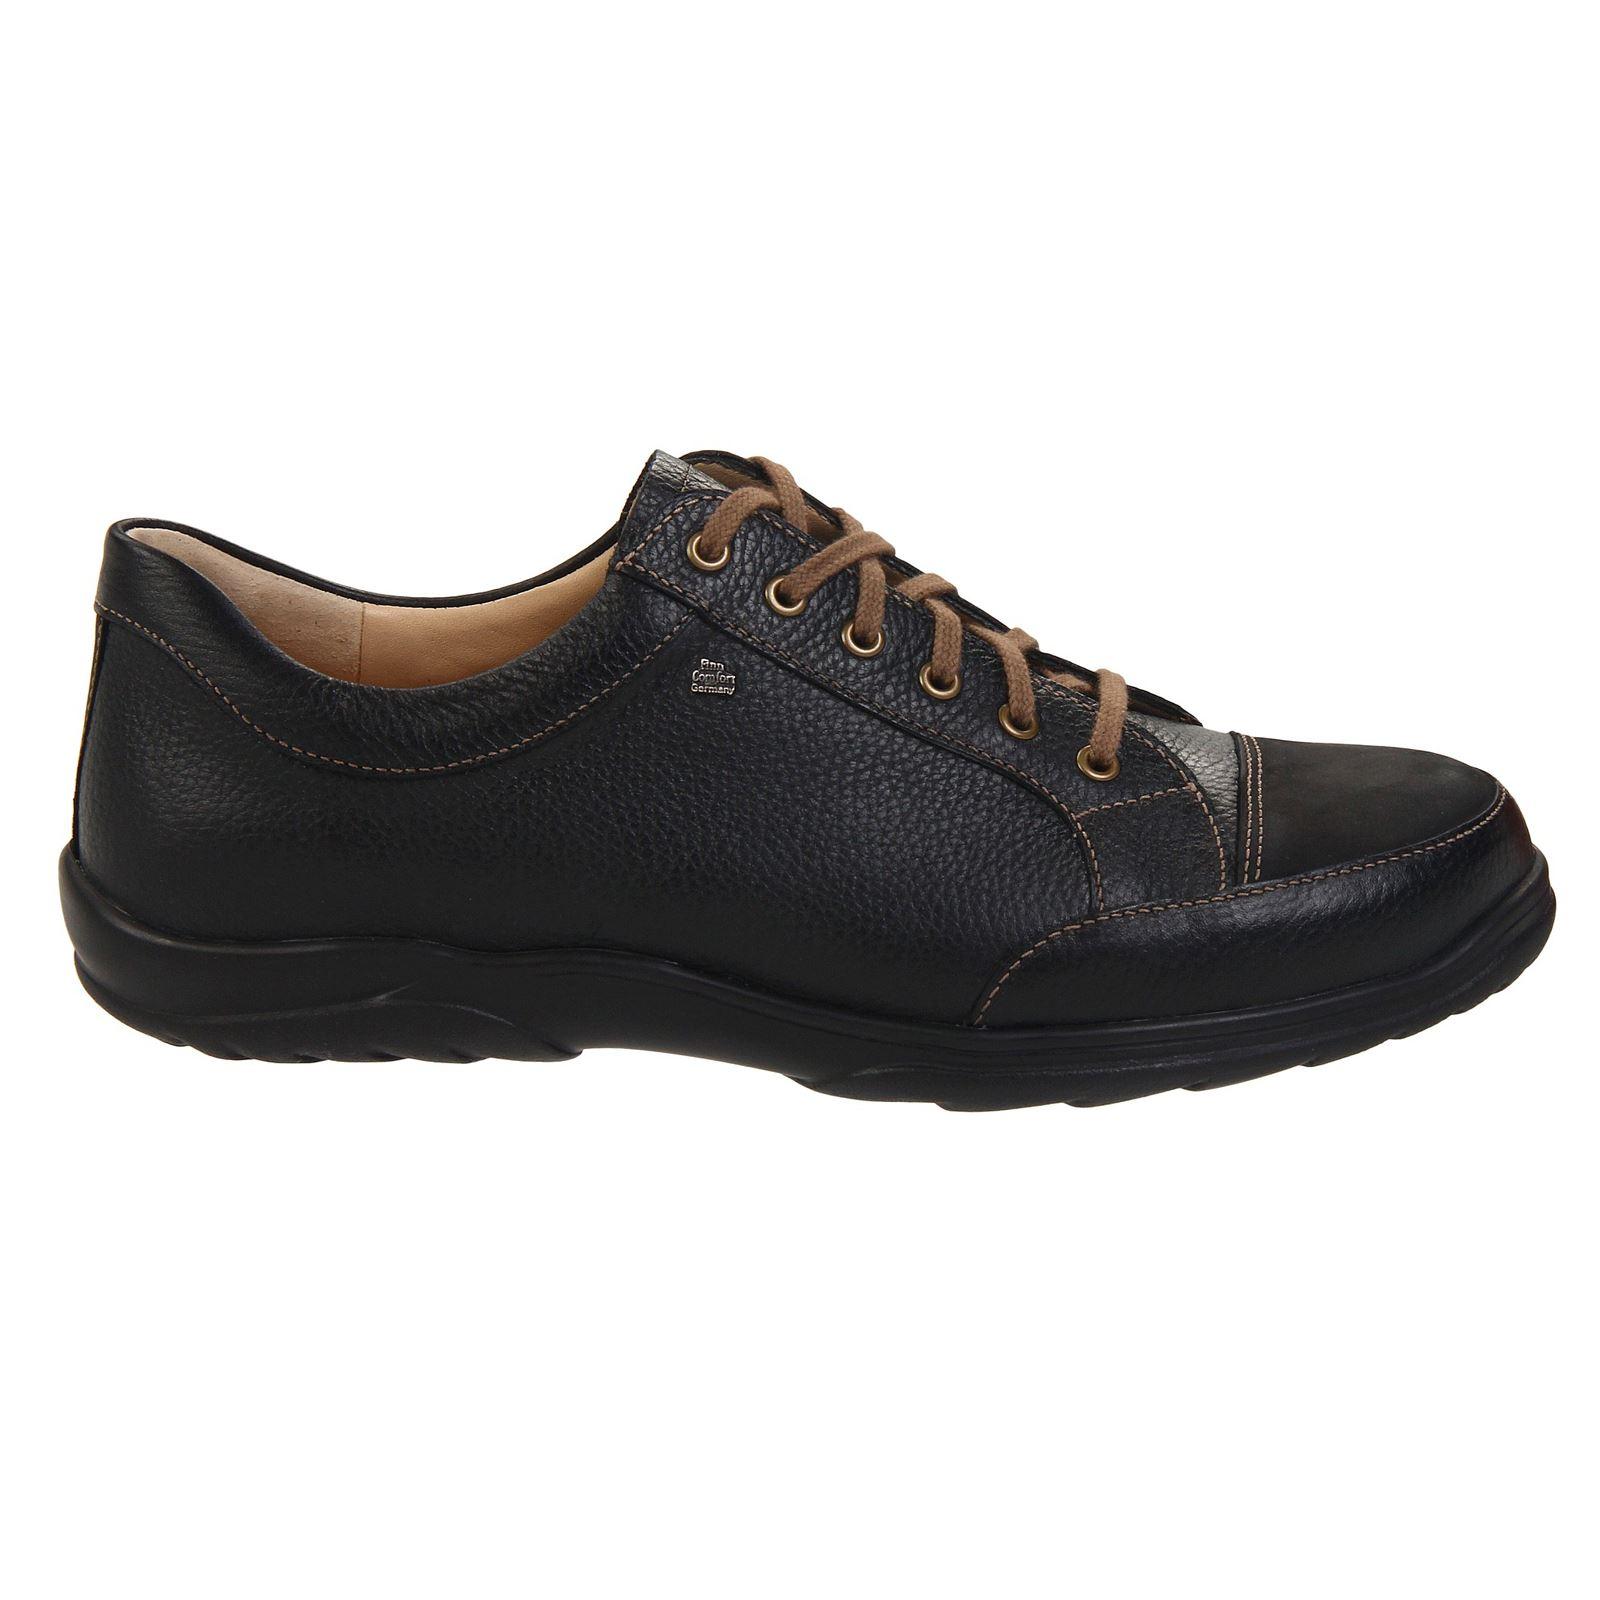 Ebay Finn Comfort Shoes Size